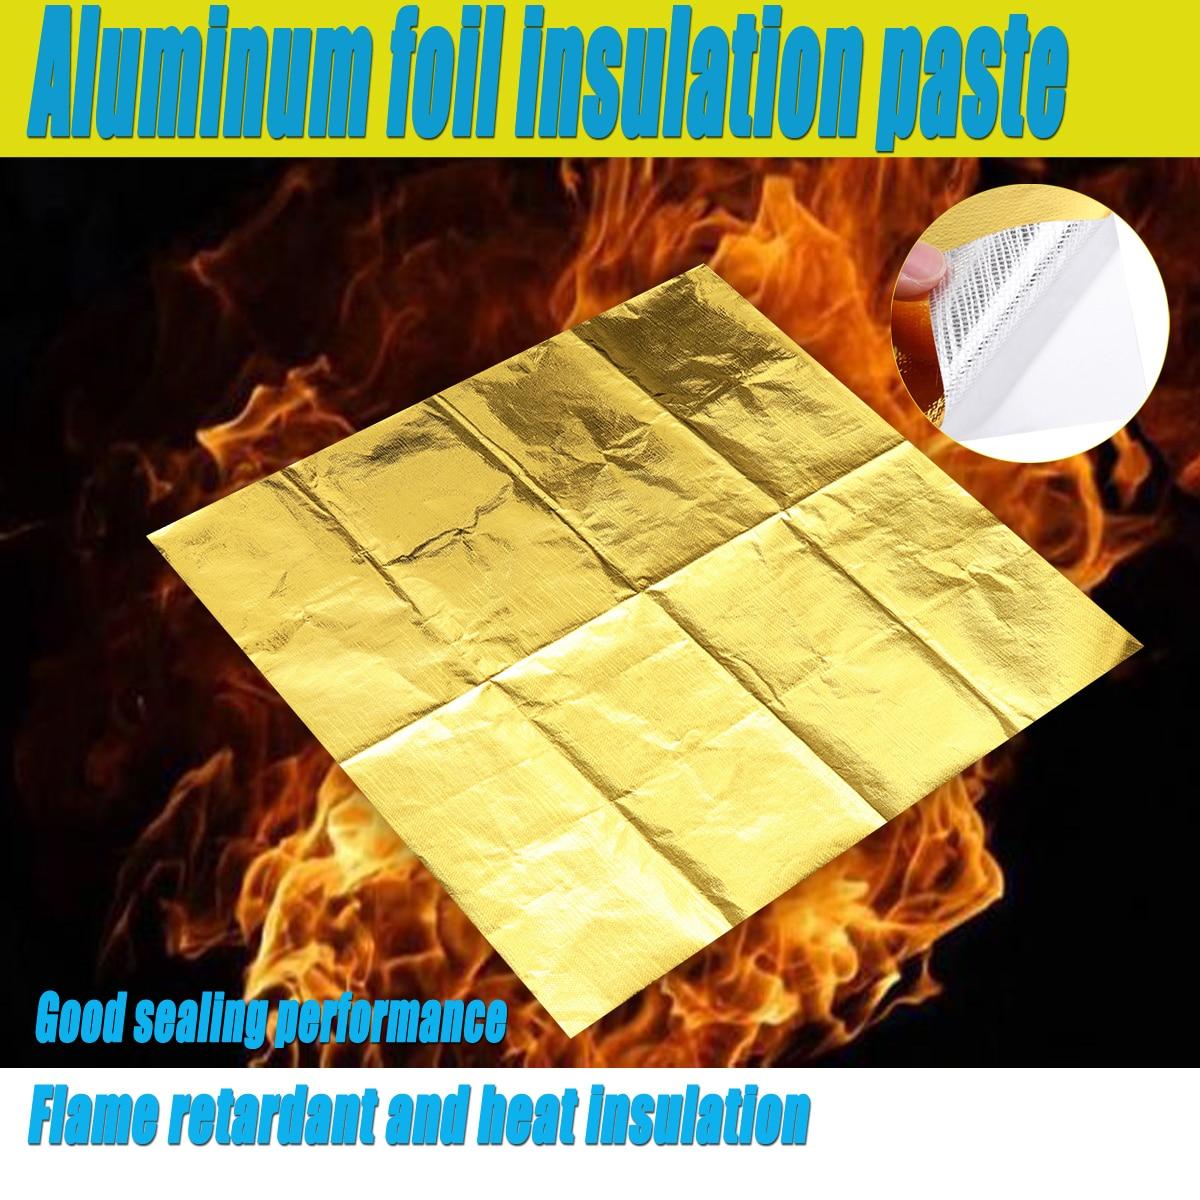 600x600mm Self Adhesive Reflective Tape Aluminum Foil Insulation High Temperature Heat Shield Wrap